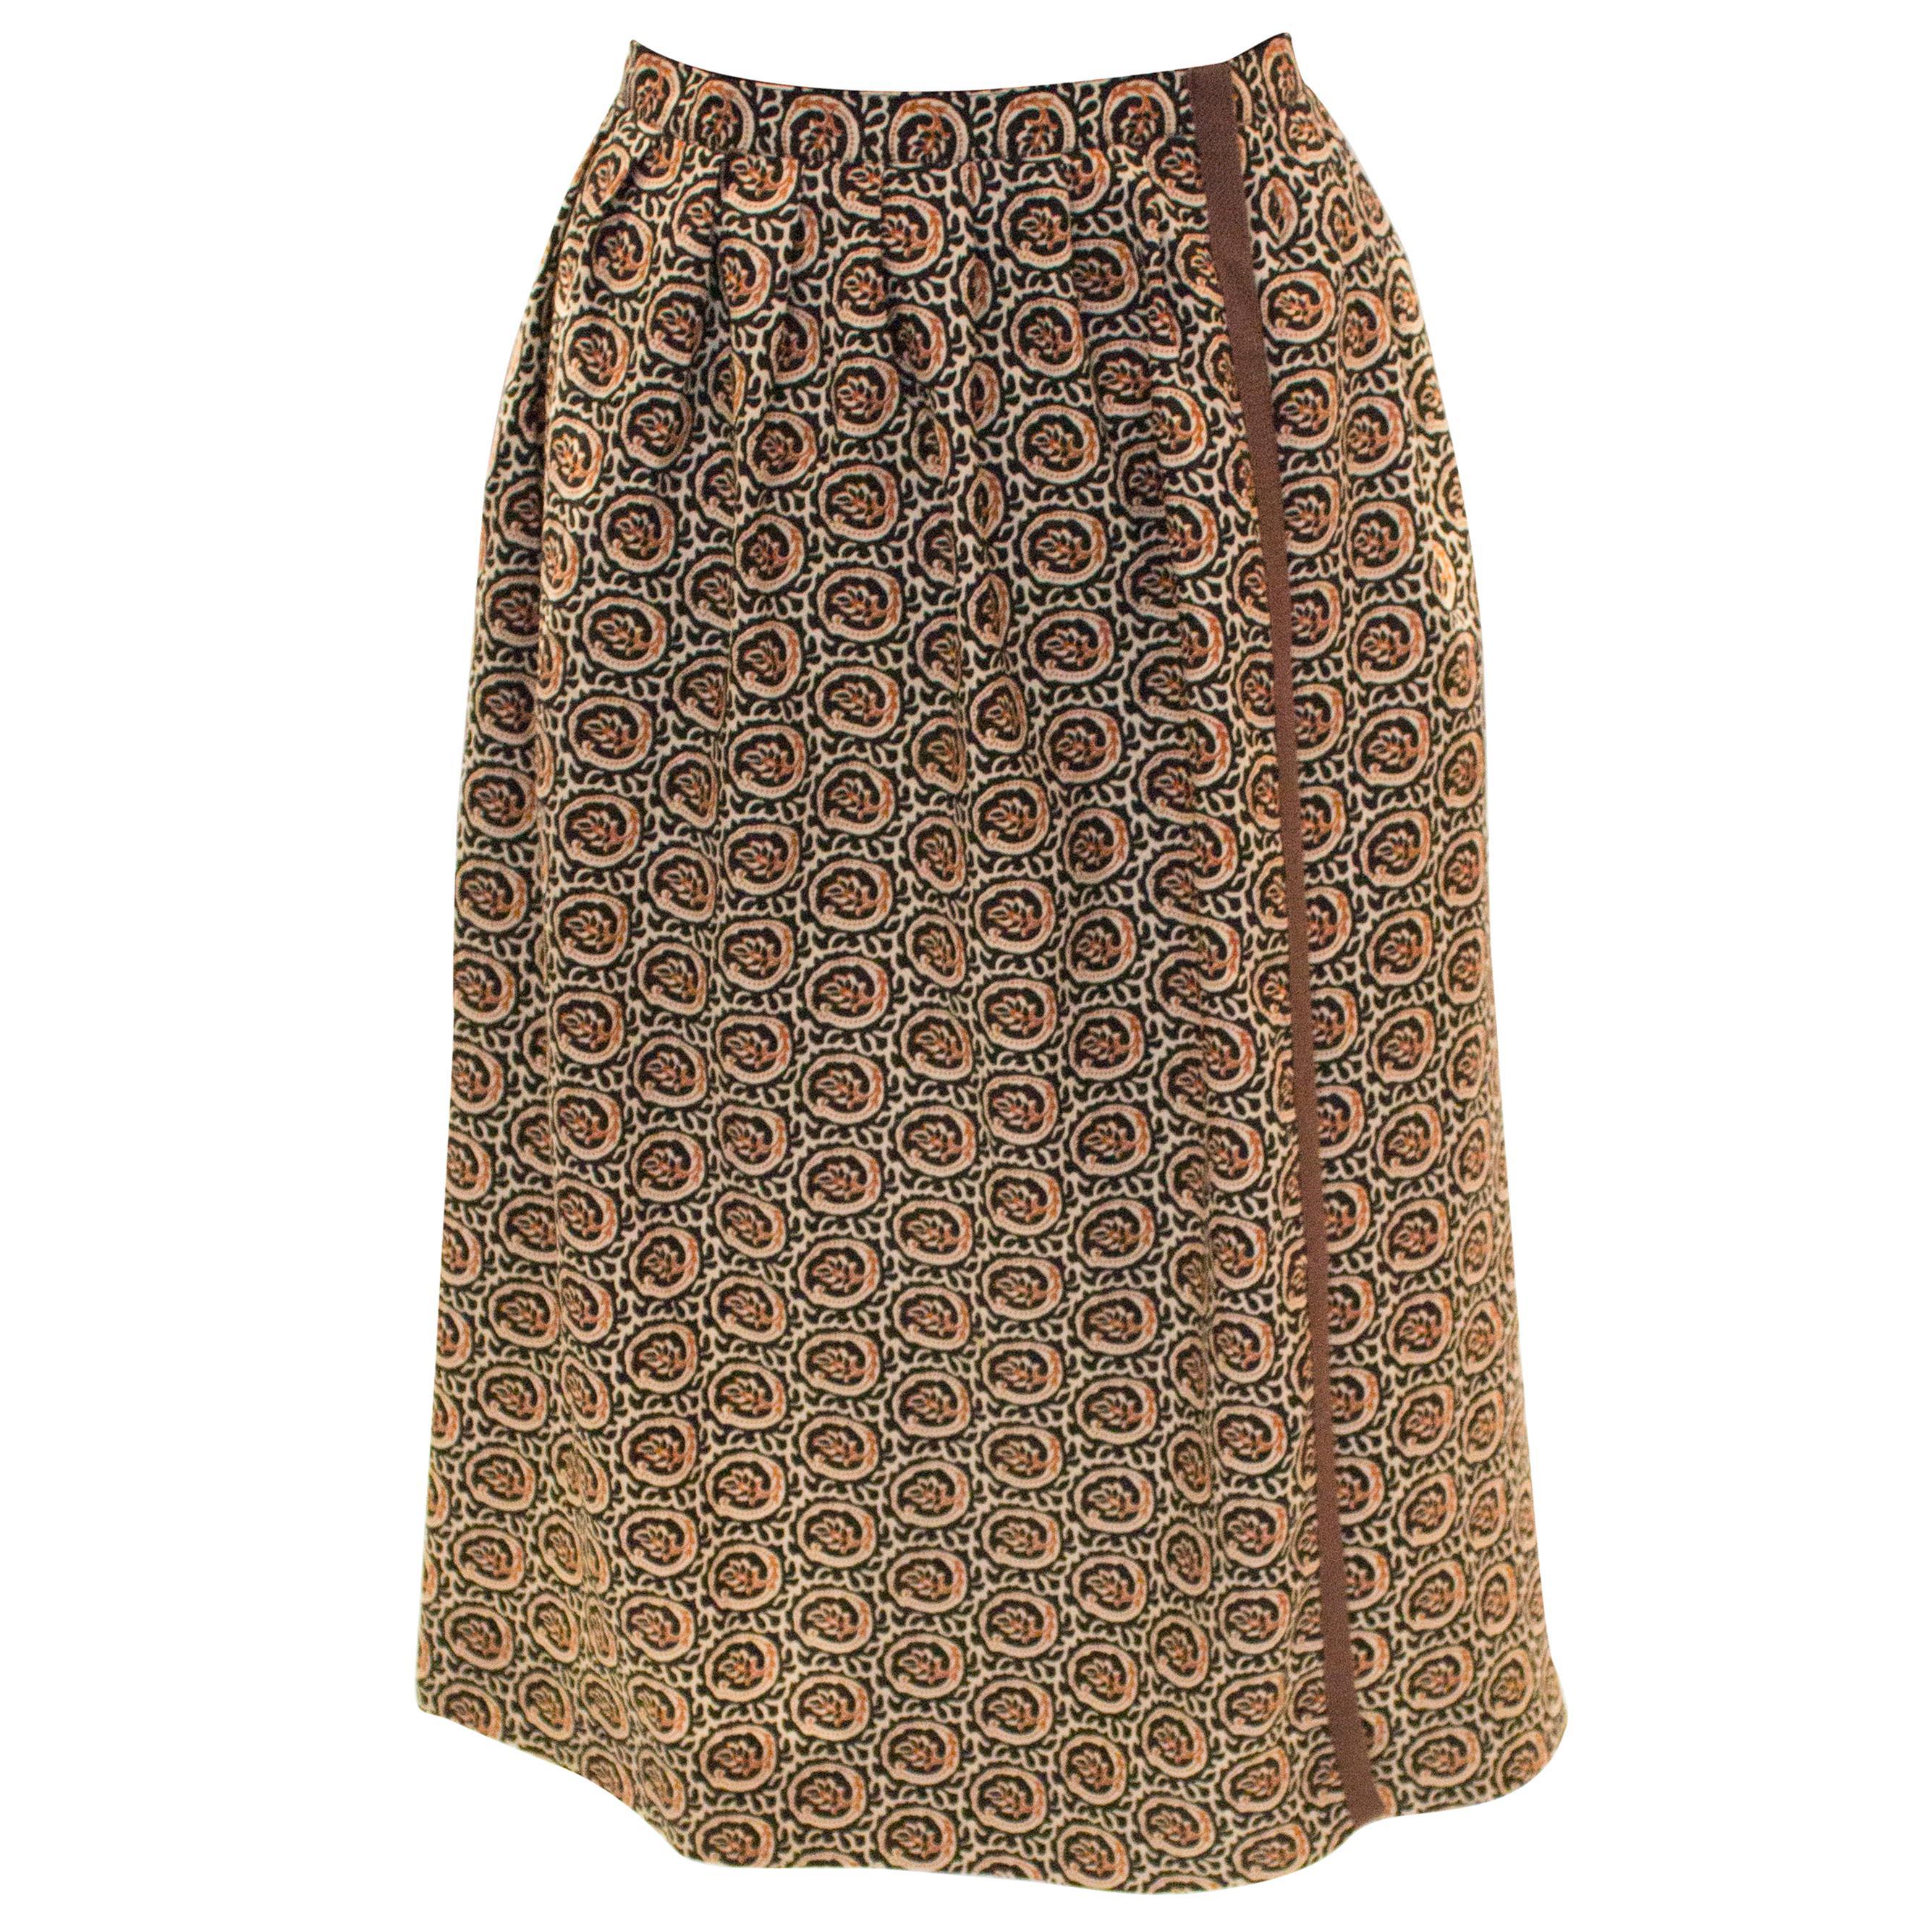 Vintage Yves Saint Laurent Rive Gauche Wrap Over Skirt